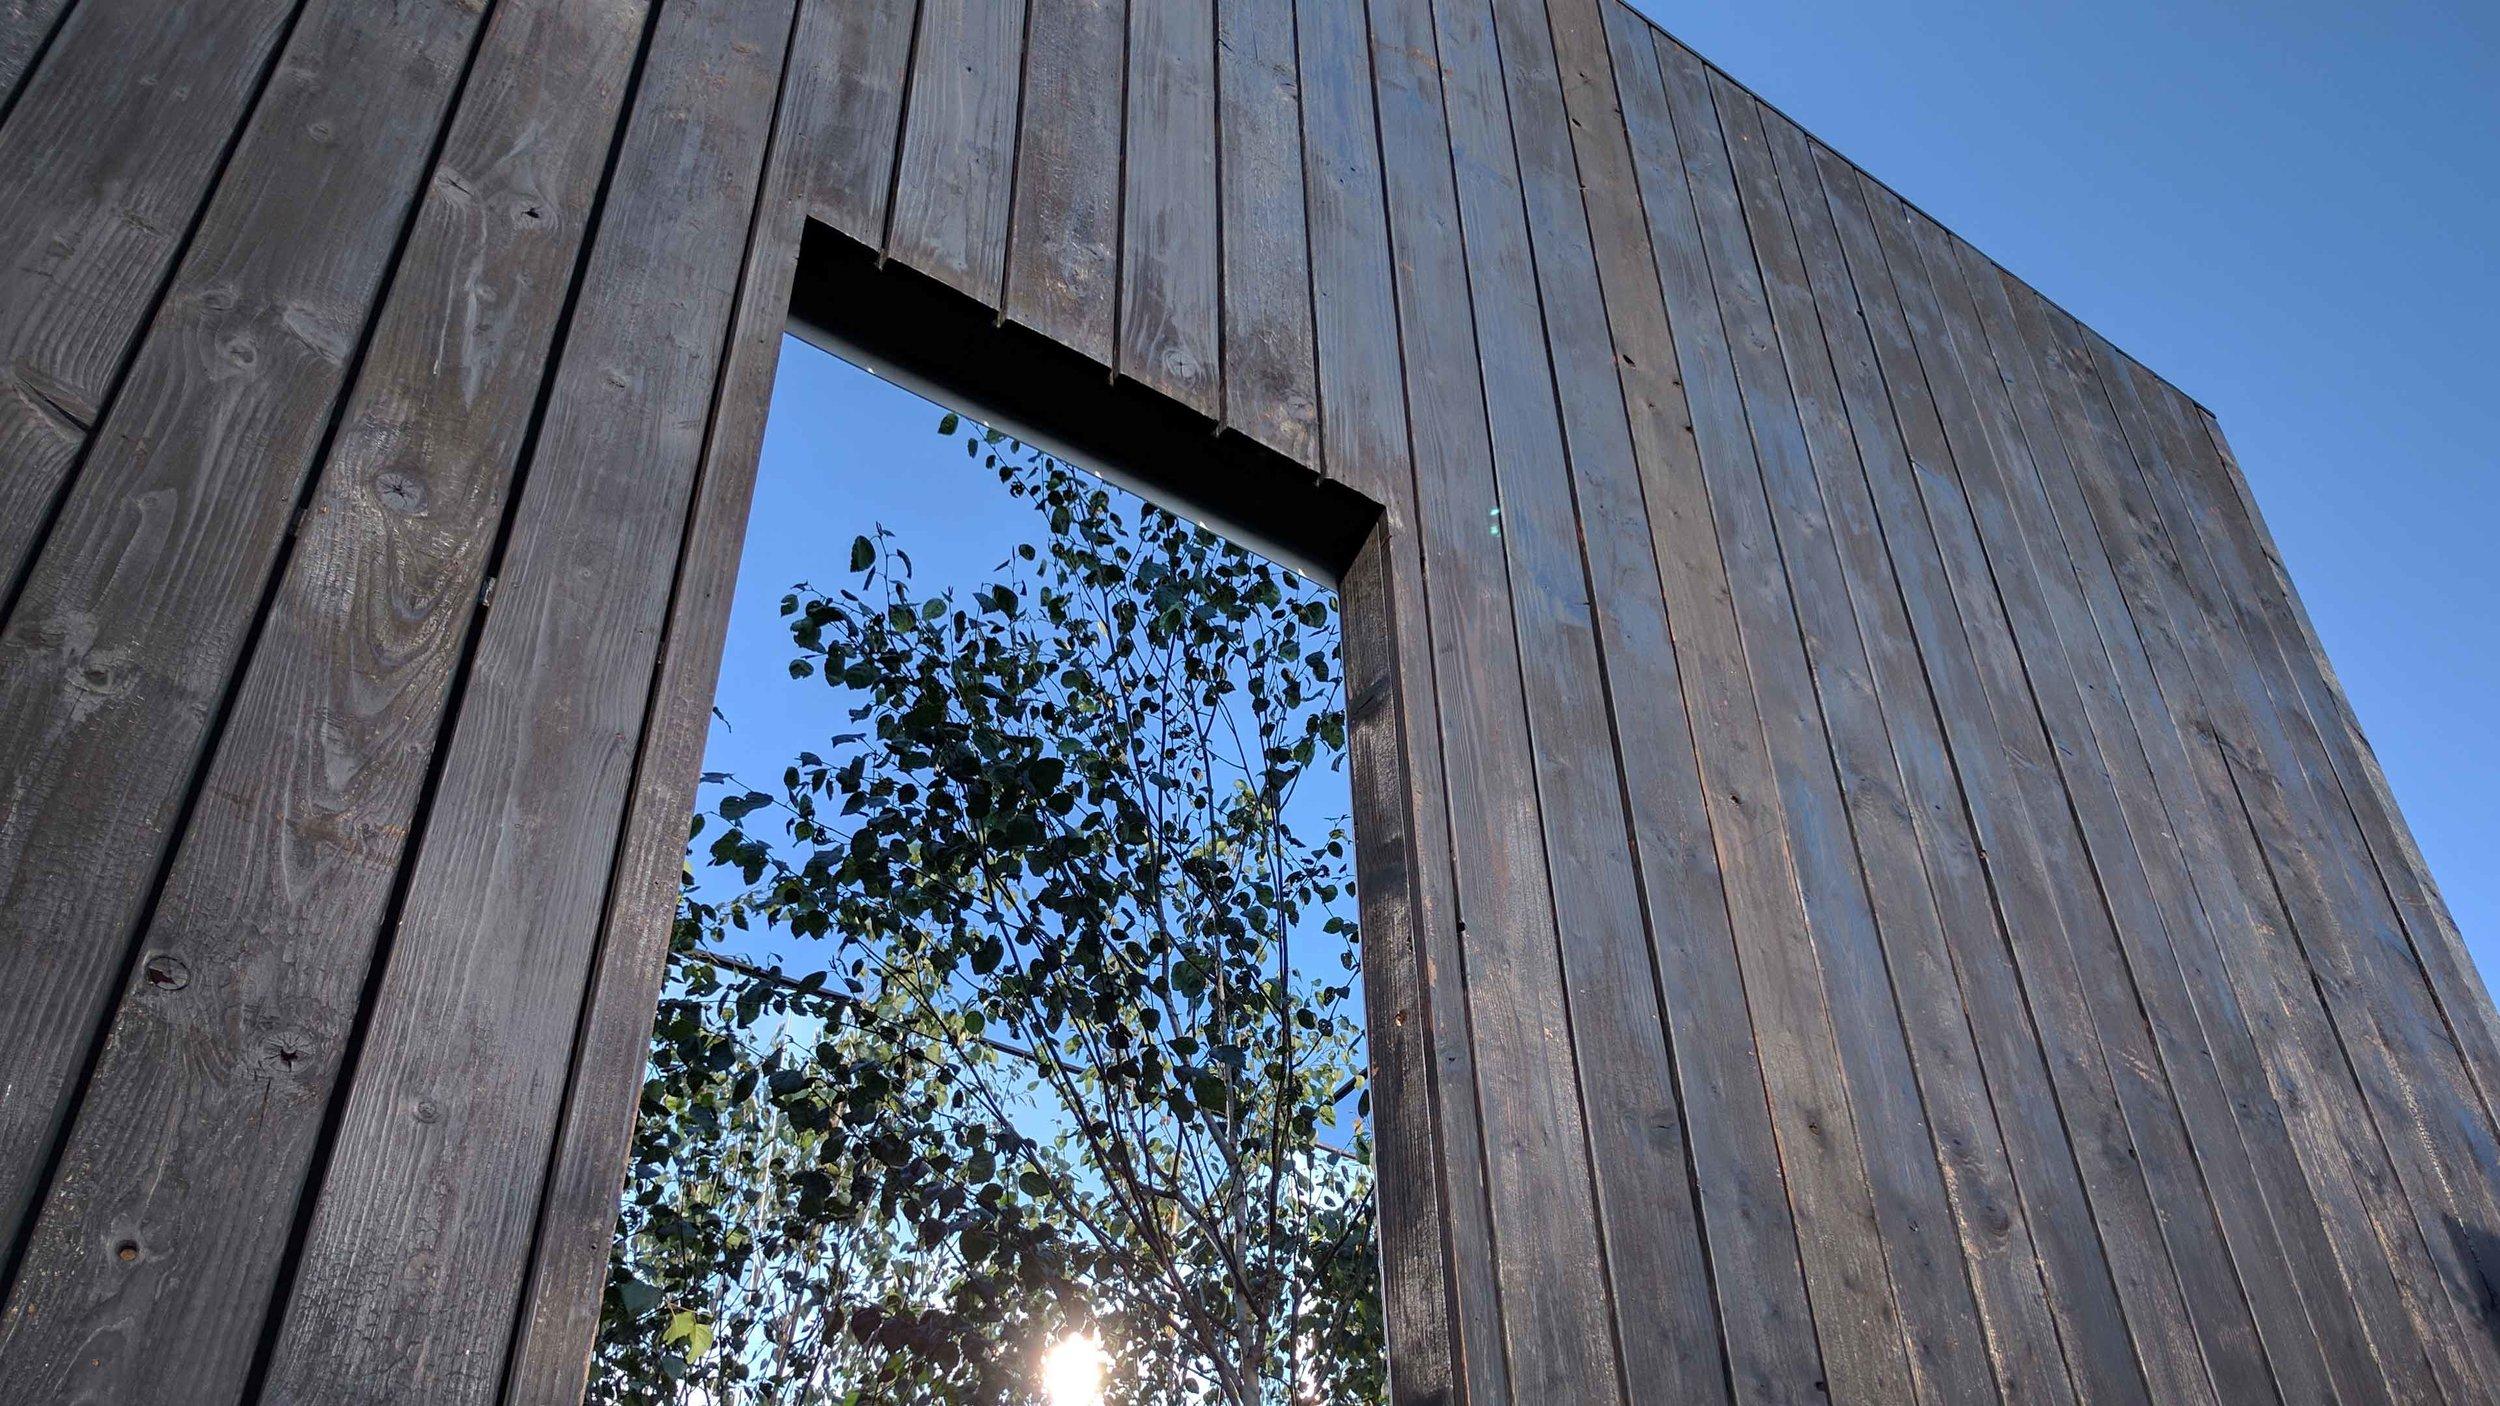 Southport Garden Design: Kuro: Doorway Into The Mirrored Cube